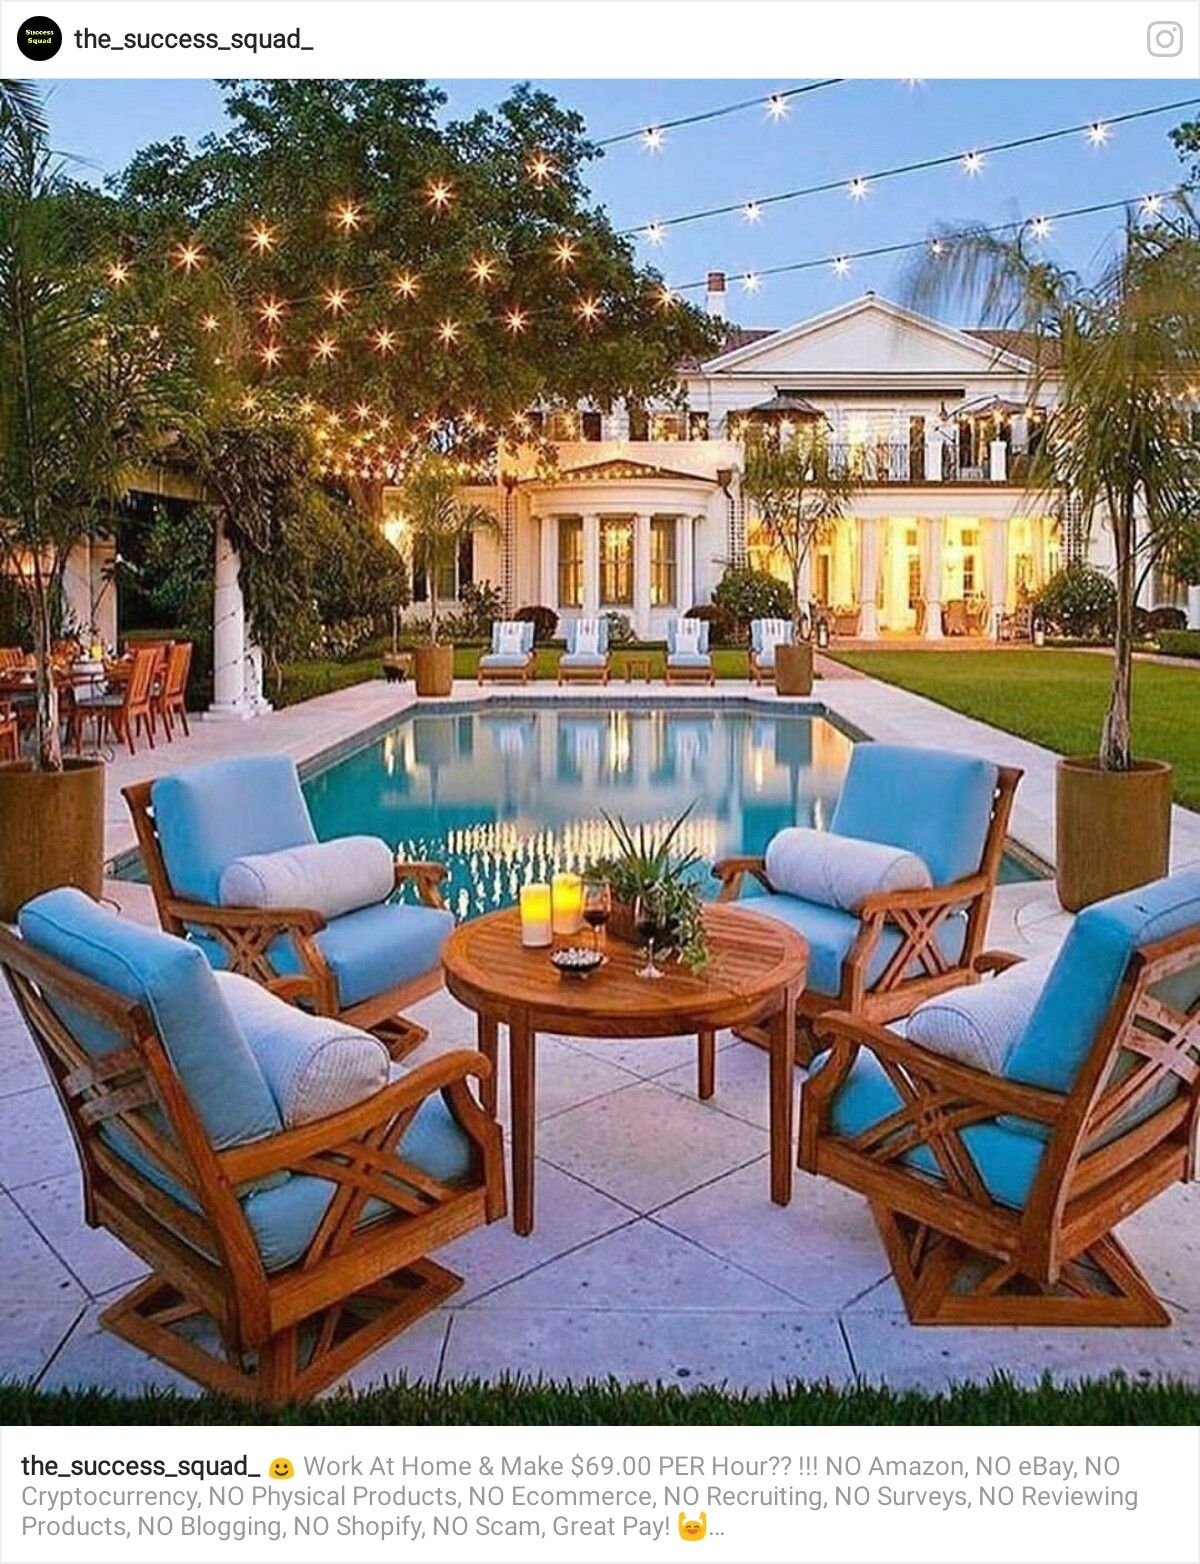 Luxurious Lifestyles image by Yonnie Smith Florida